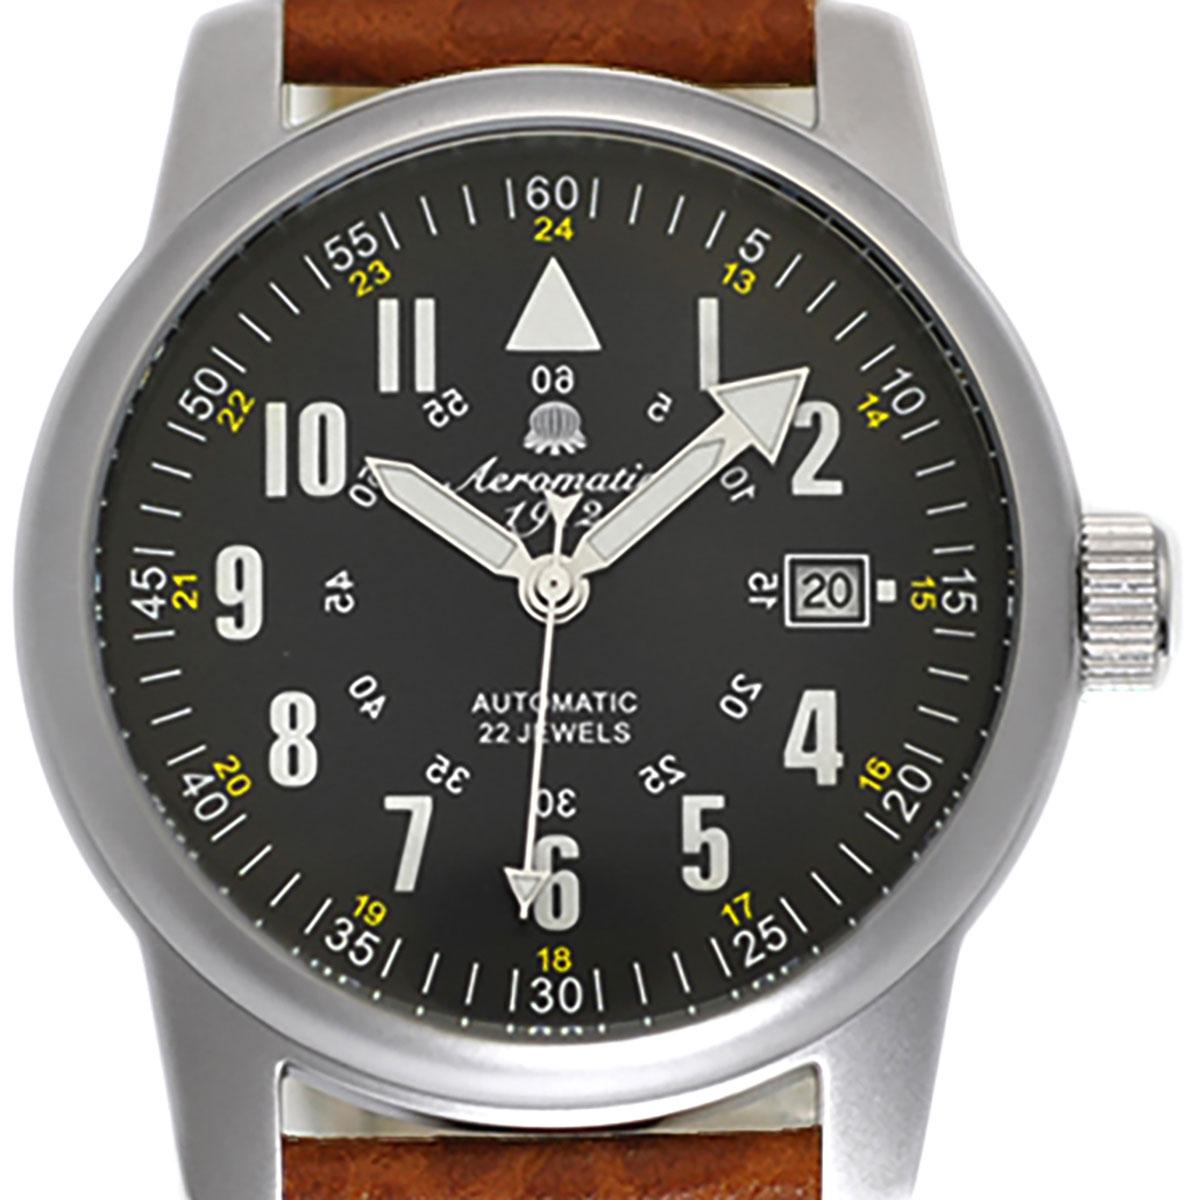 Aeromatic1912 エアロマティック1912 自動巻き(手巻き機能あり) 腕時計 [A1027B] 並行輸入品  デイト